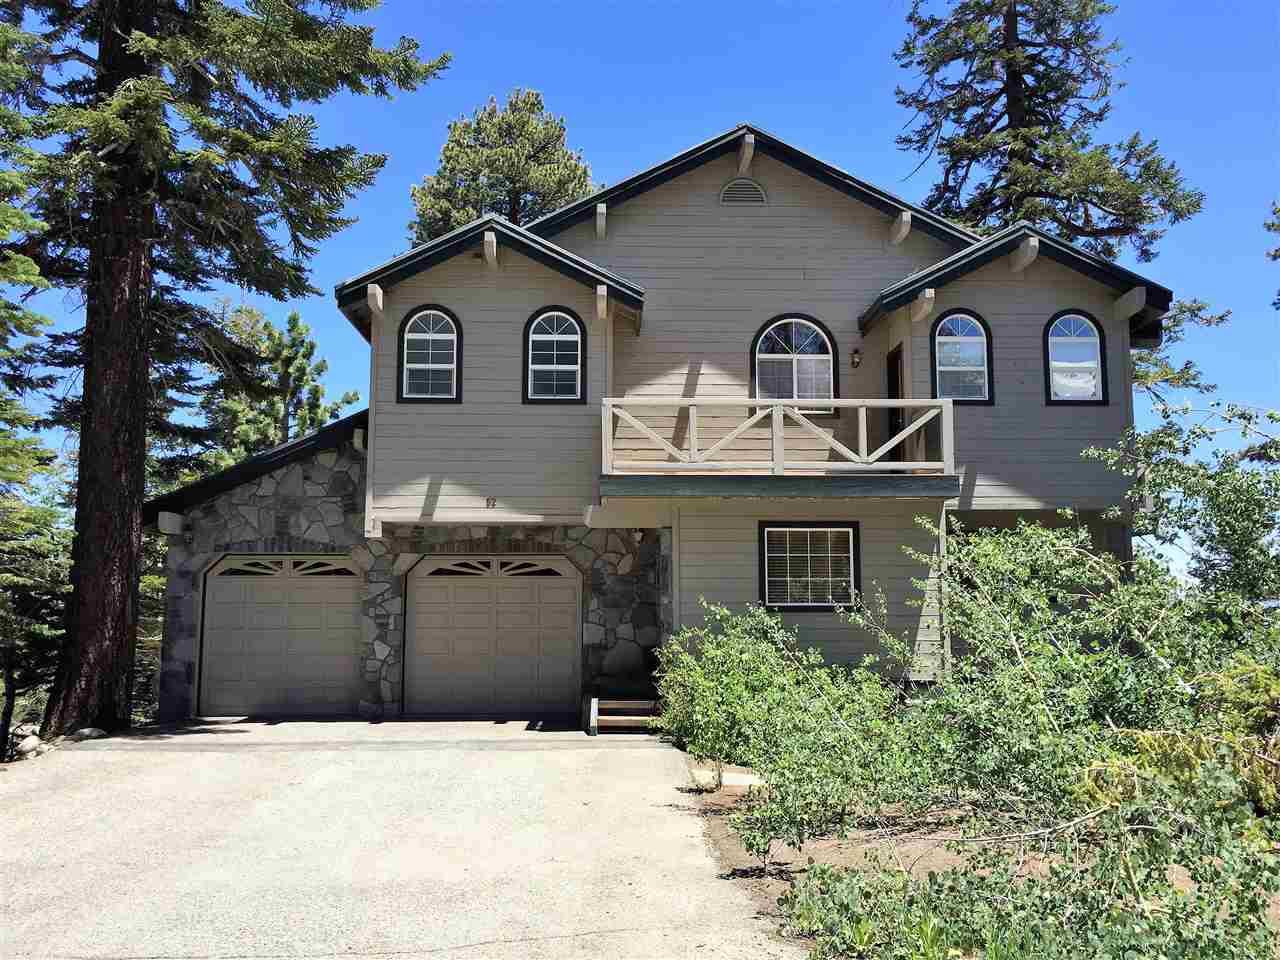 52 Aspen Lane, Mammoth Lakes, CA 93546